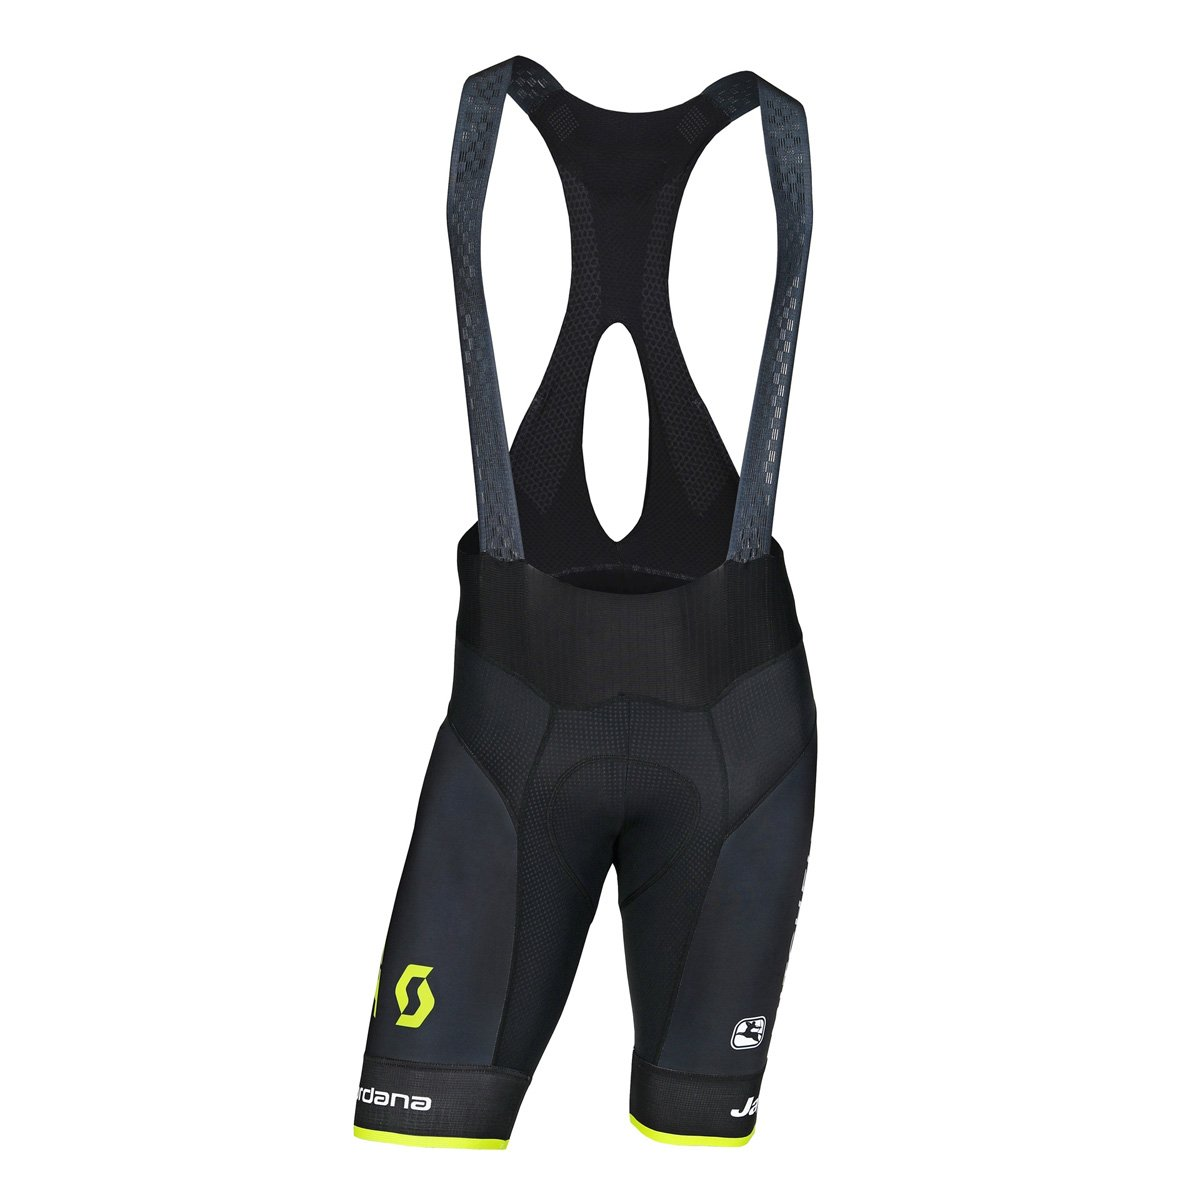 Giordana 2018 Mens Mitchelton-Scott FRC Pro Cycling Bib Shorts GICS18-BIBS-FRCP-MITC